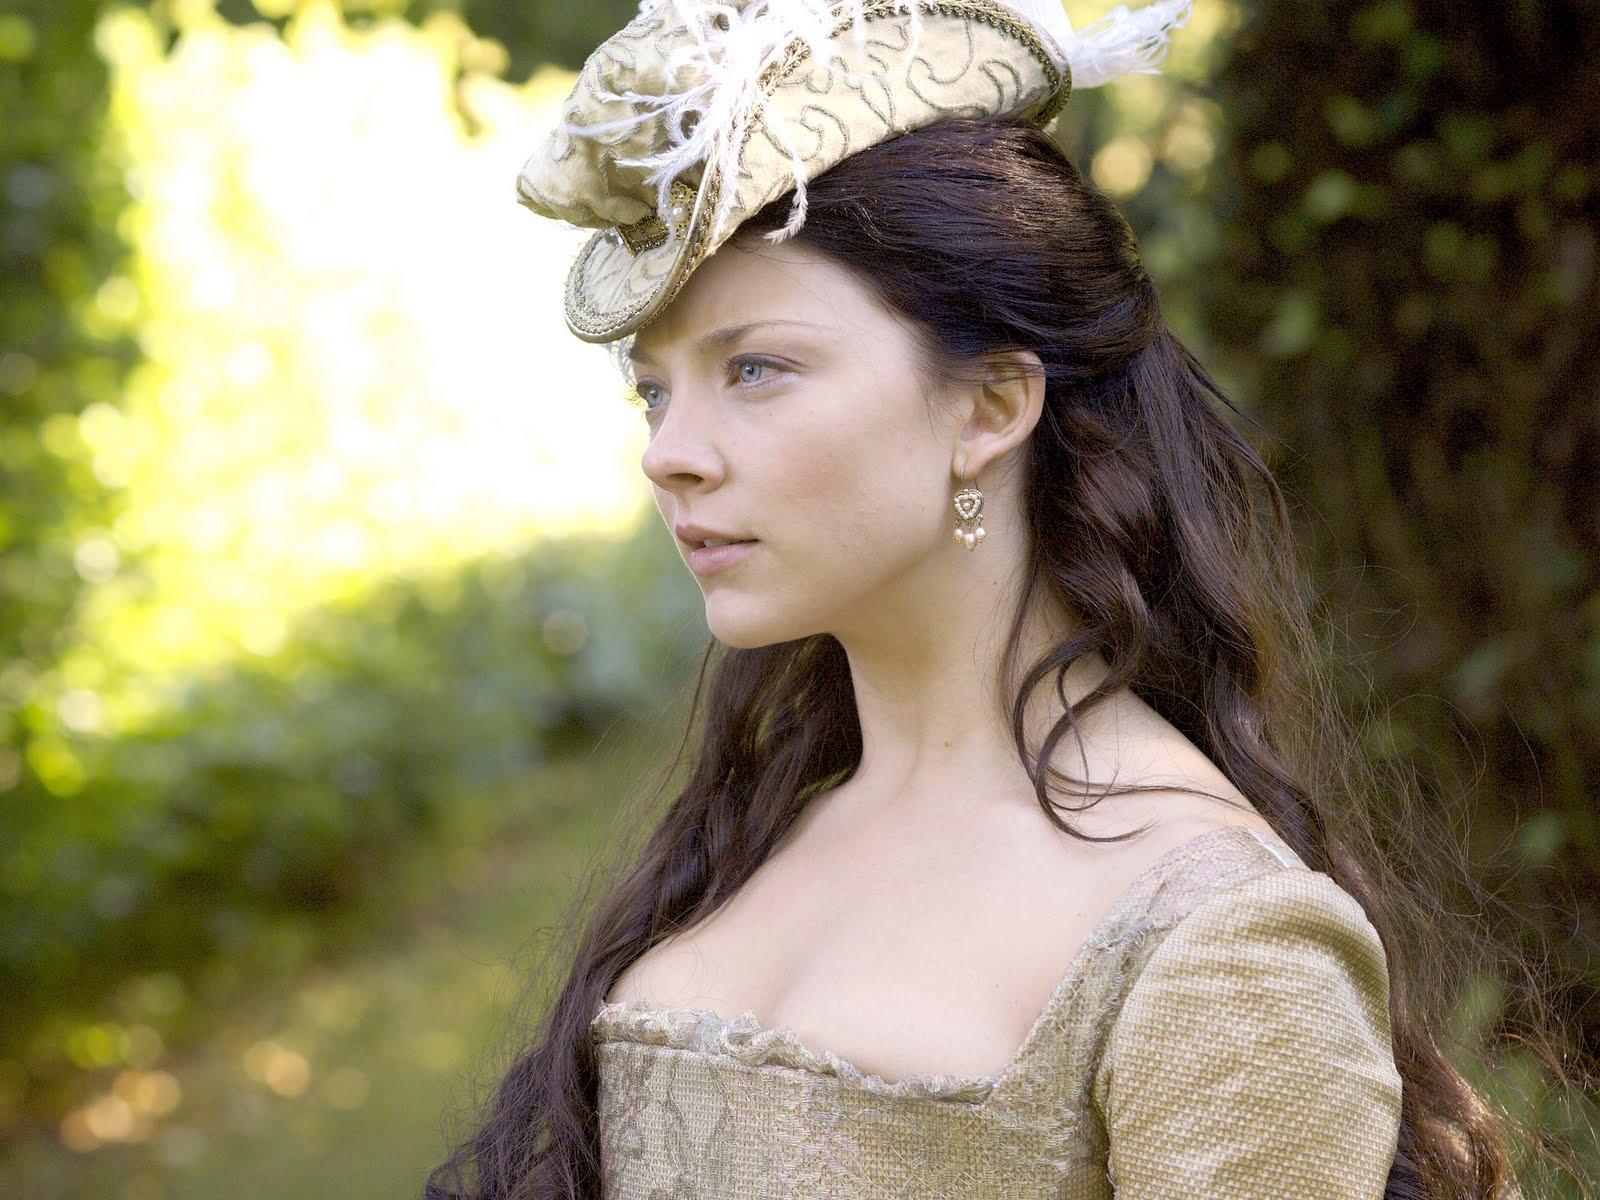 Natalie Dormer As Anne Boleyn Natalie Dormer As Anne Boleyn